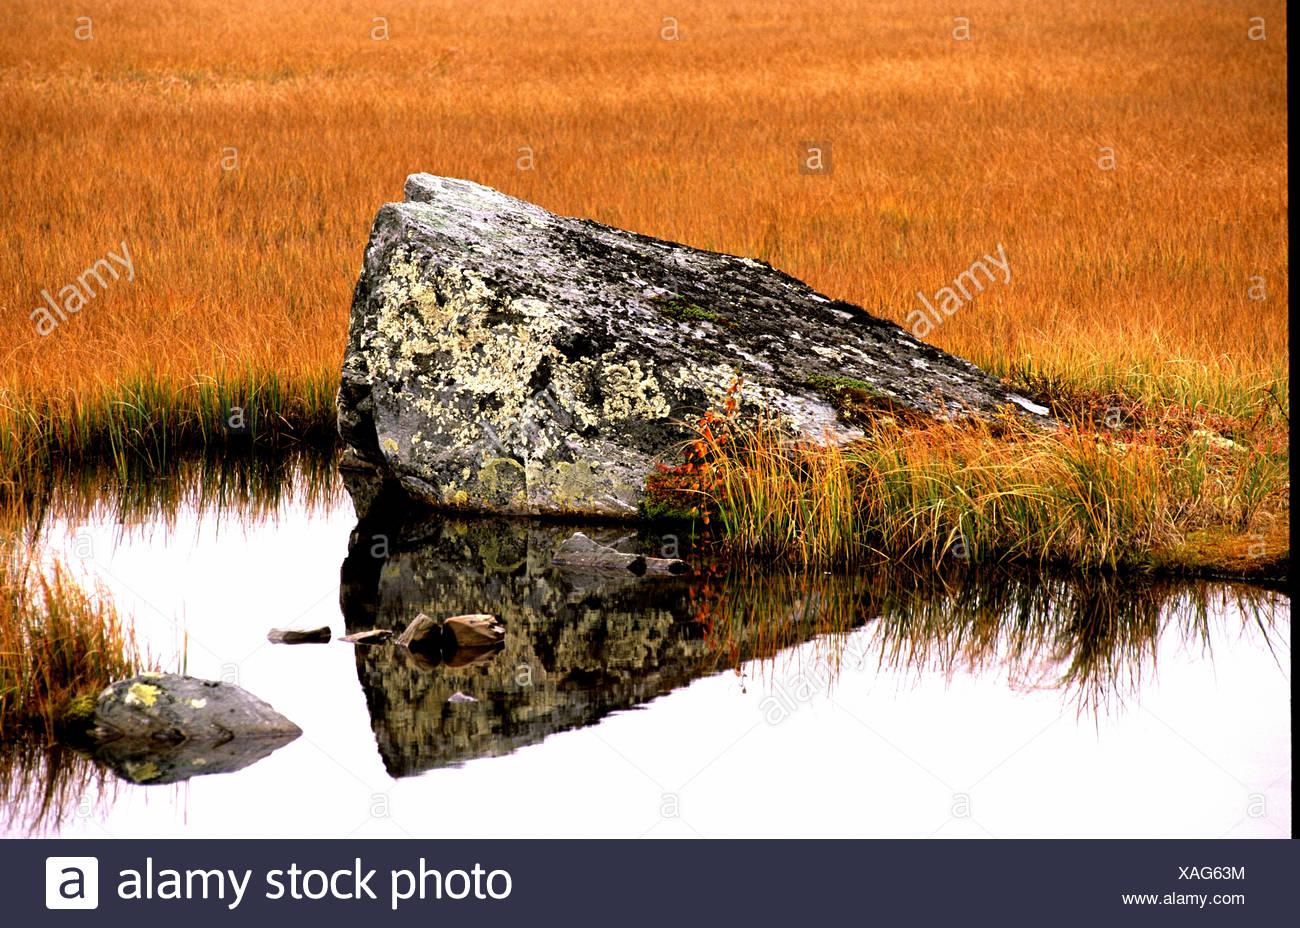 boulder municipality Oystre Slidre grass Jotunheimvegen scenery moor Norway Europe Oppland lake sea Segg - Stock Image